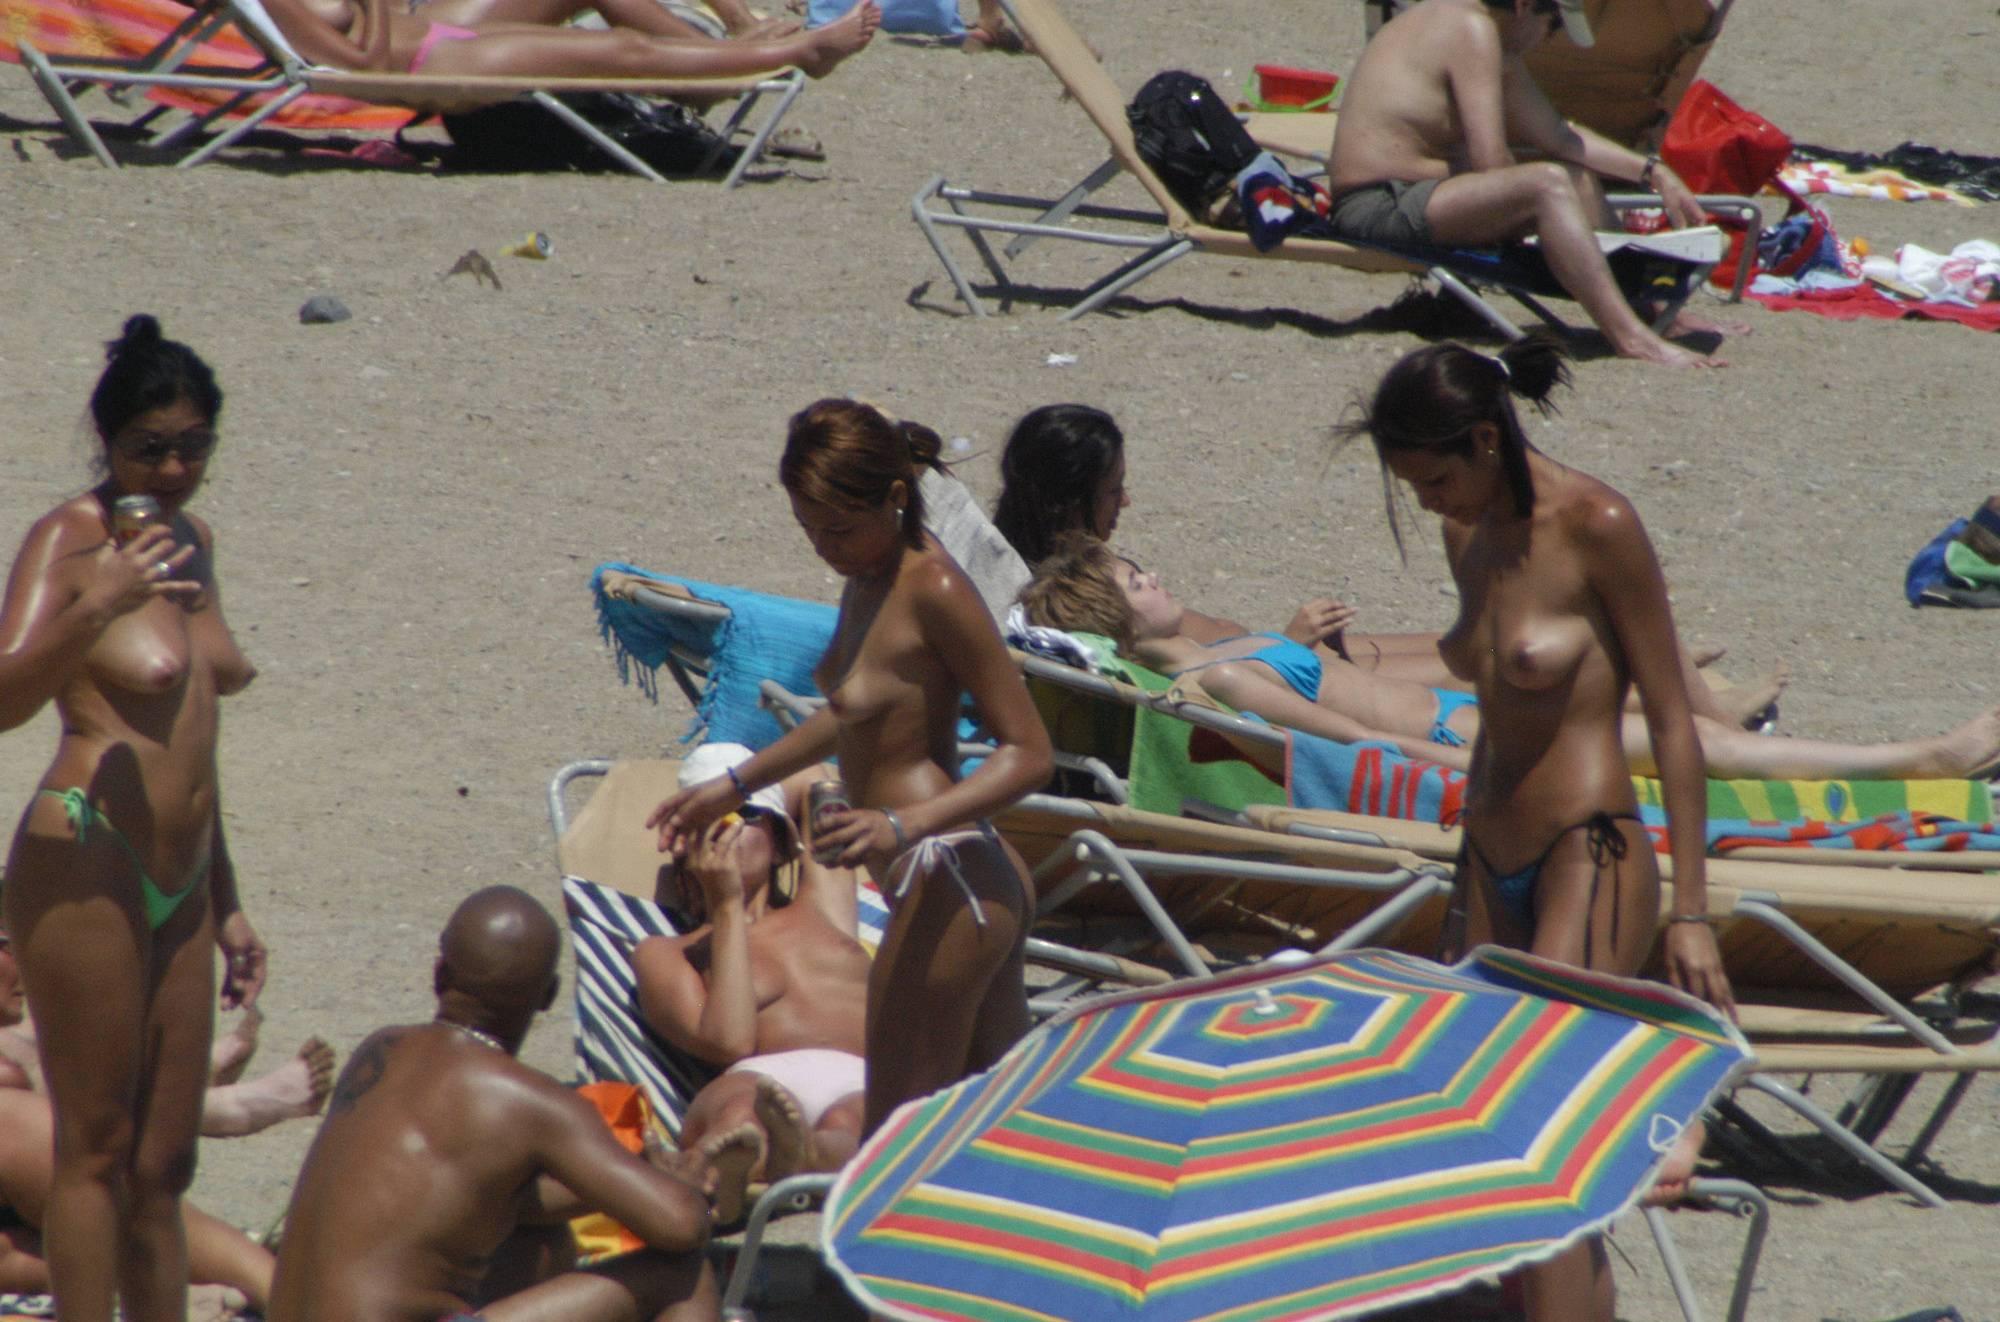 Pure Nudism Gallery Barcelona Topless Beach - 2